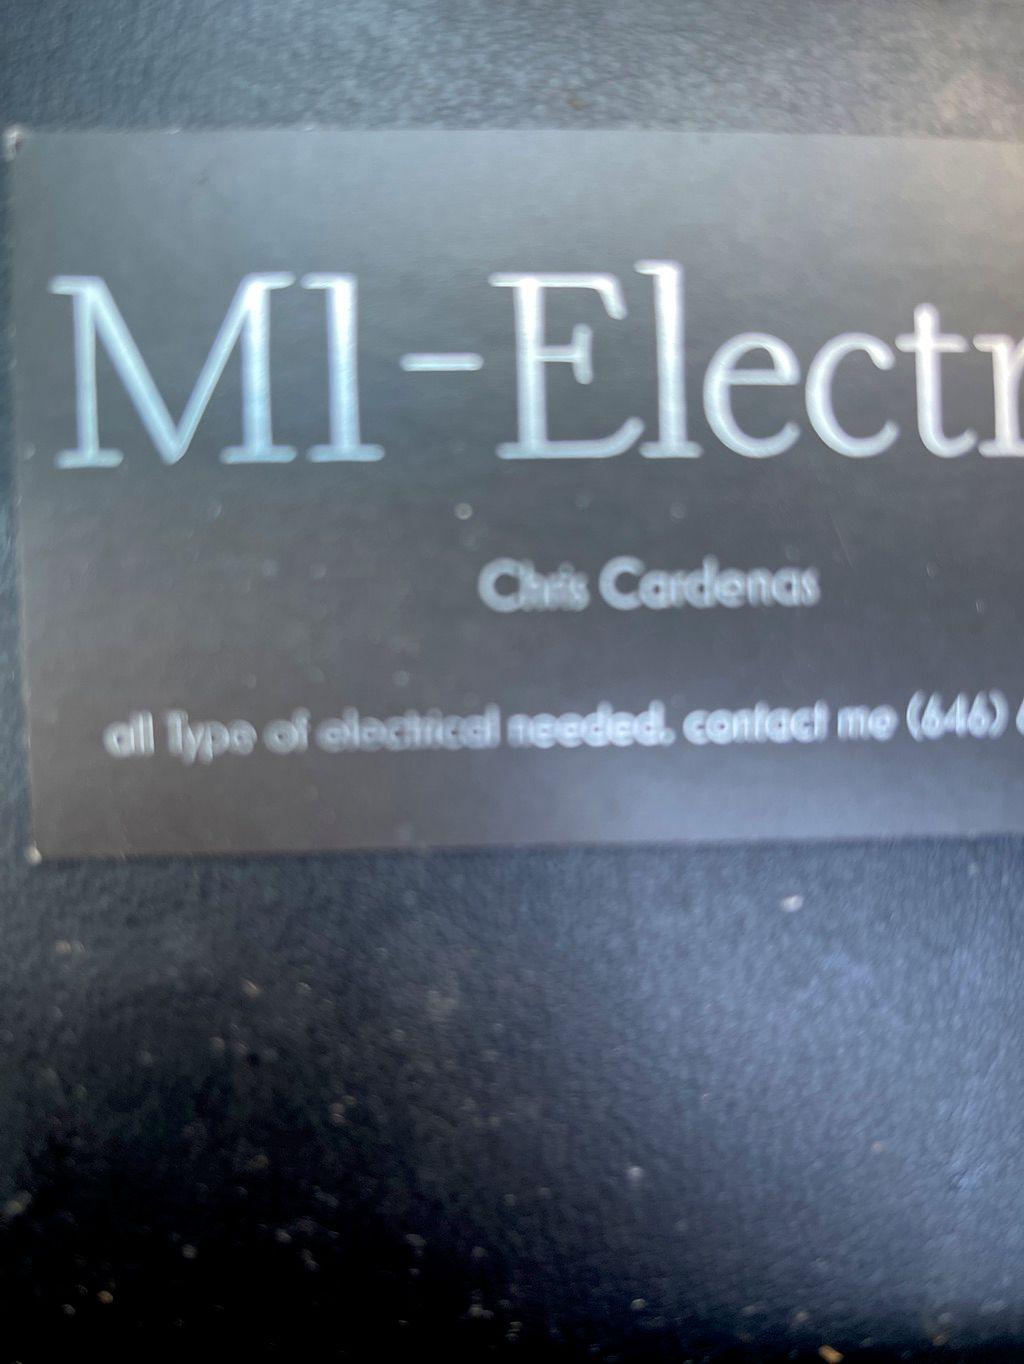 M1-Electric